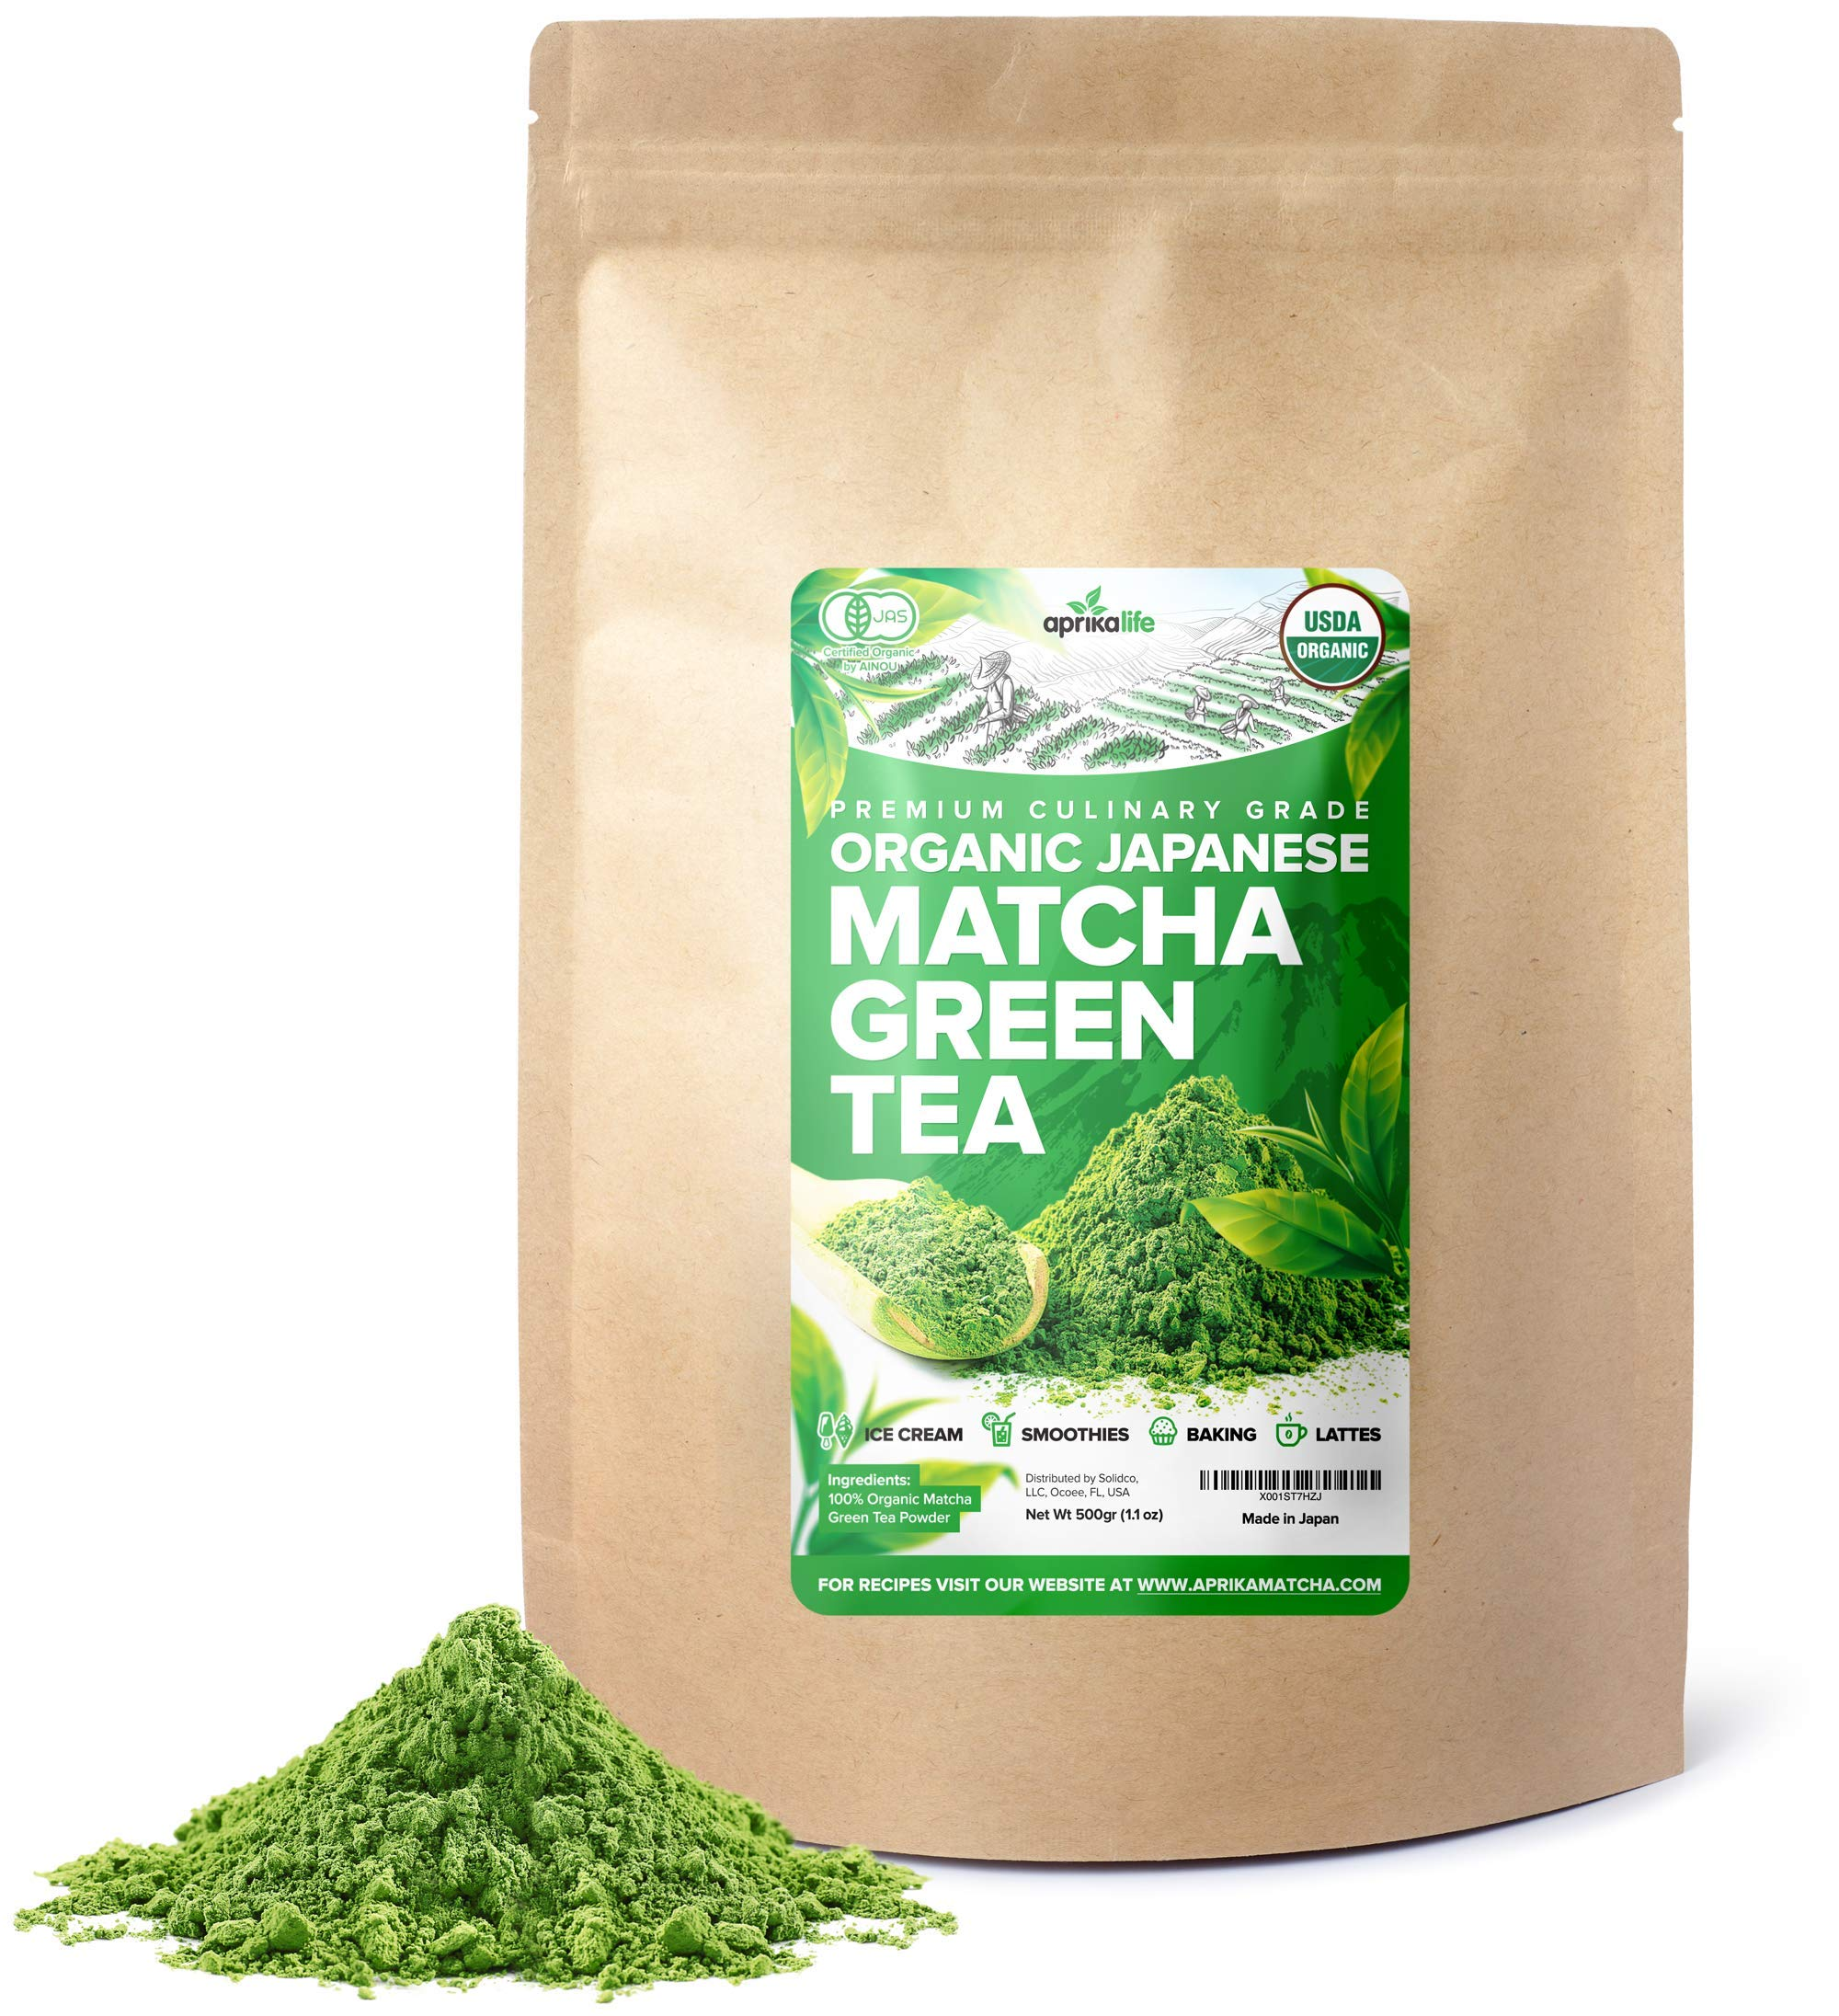 Premium Organic Japanese Matcha Green Tea Powder - USDA & JAS Organic - Authentic Japanese Origin - Culinary Grade - [500g / 1.1 LB Value Size] by Aprika Life